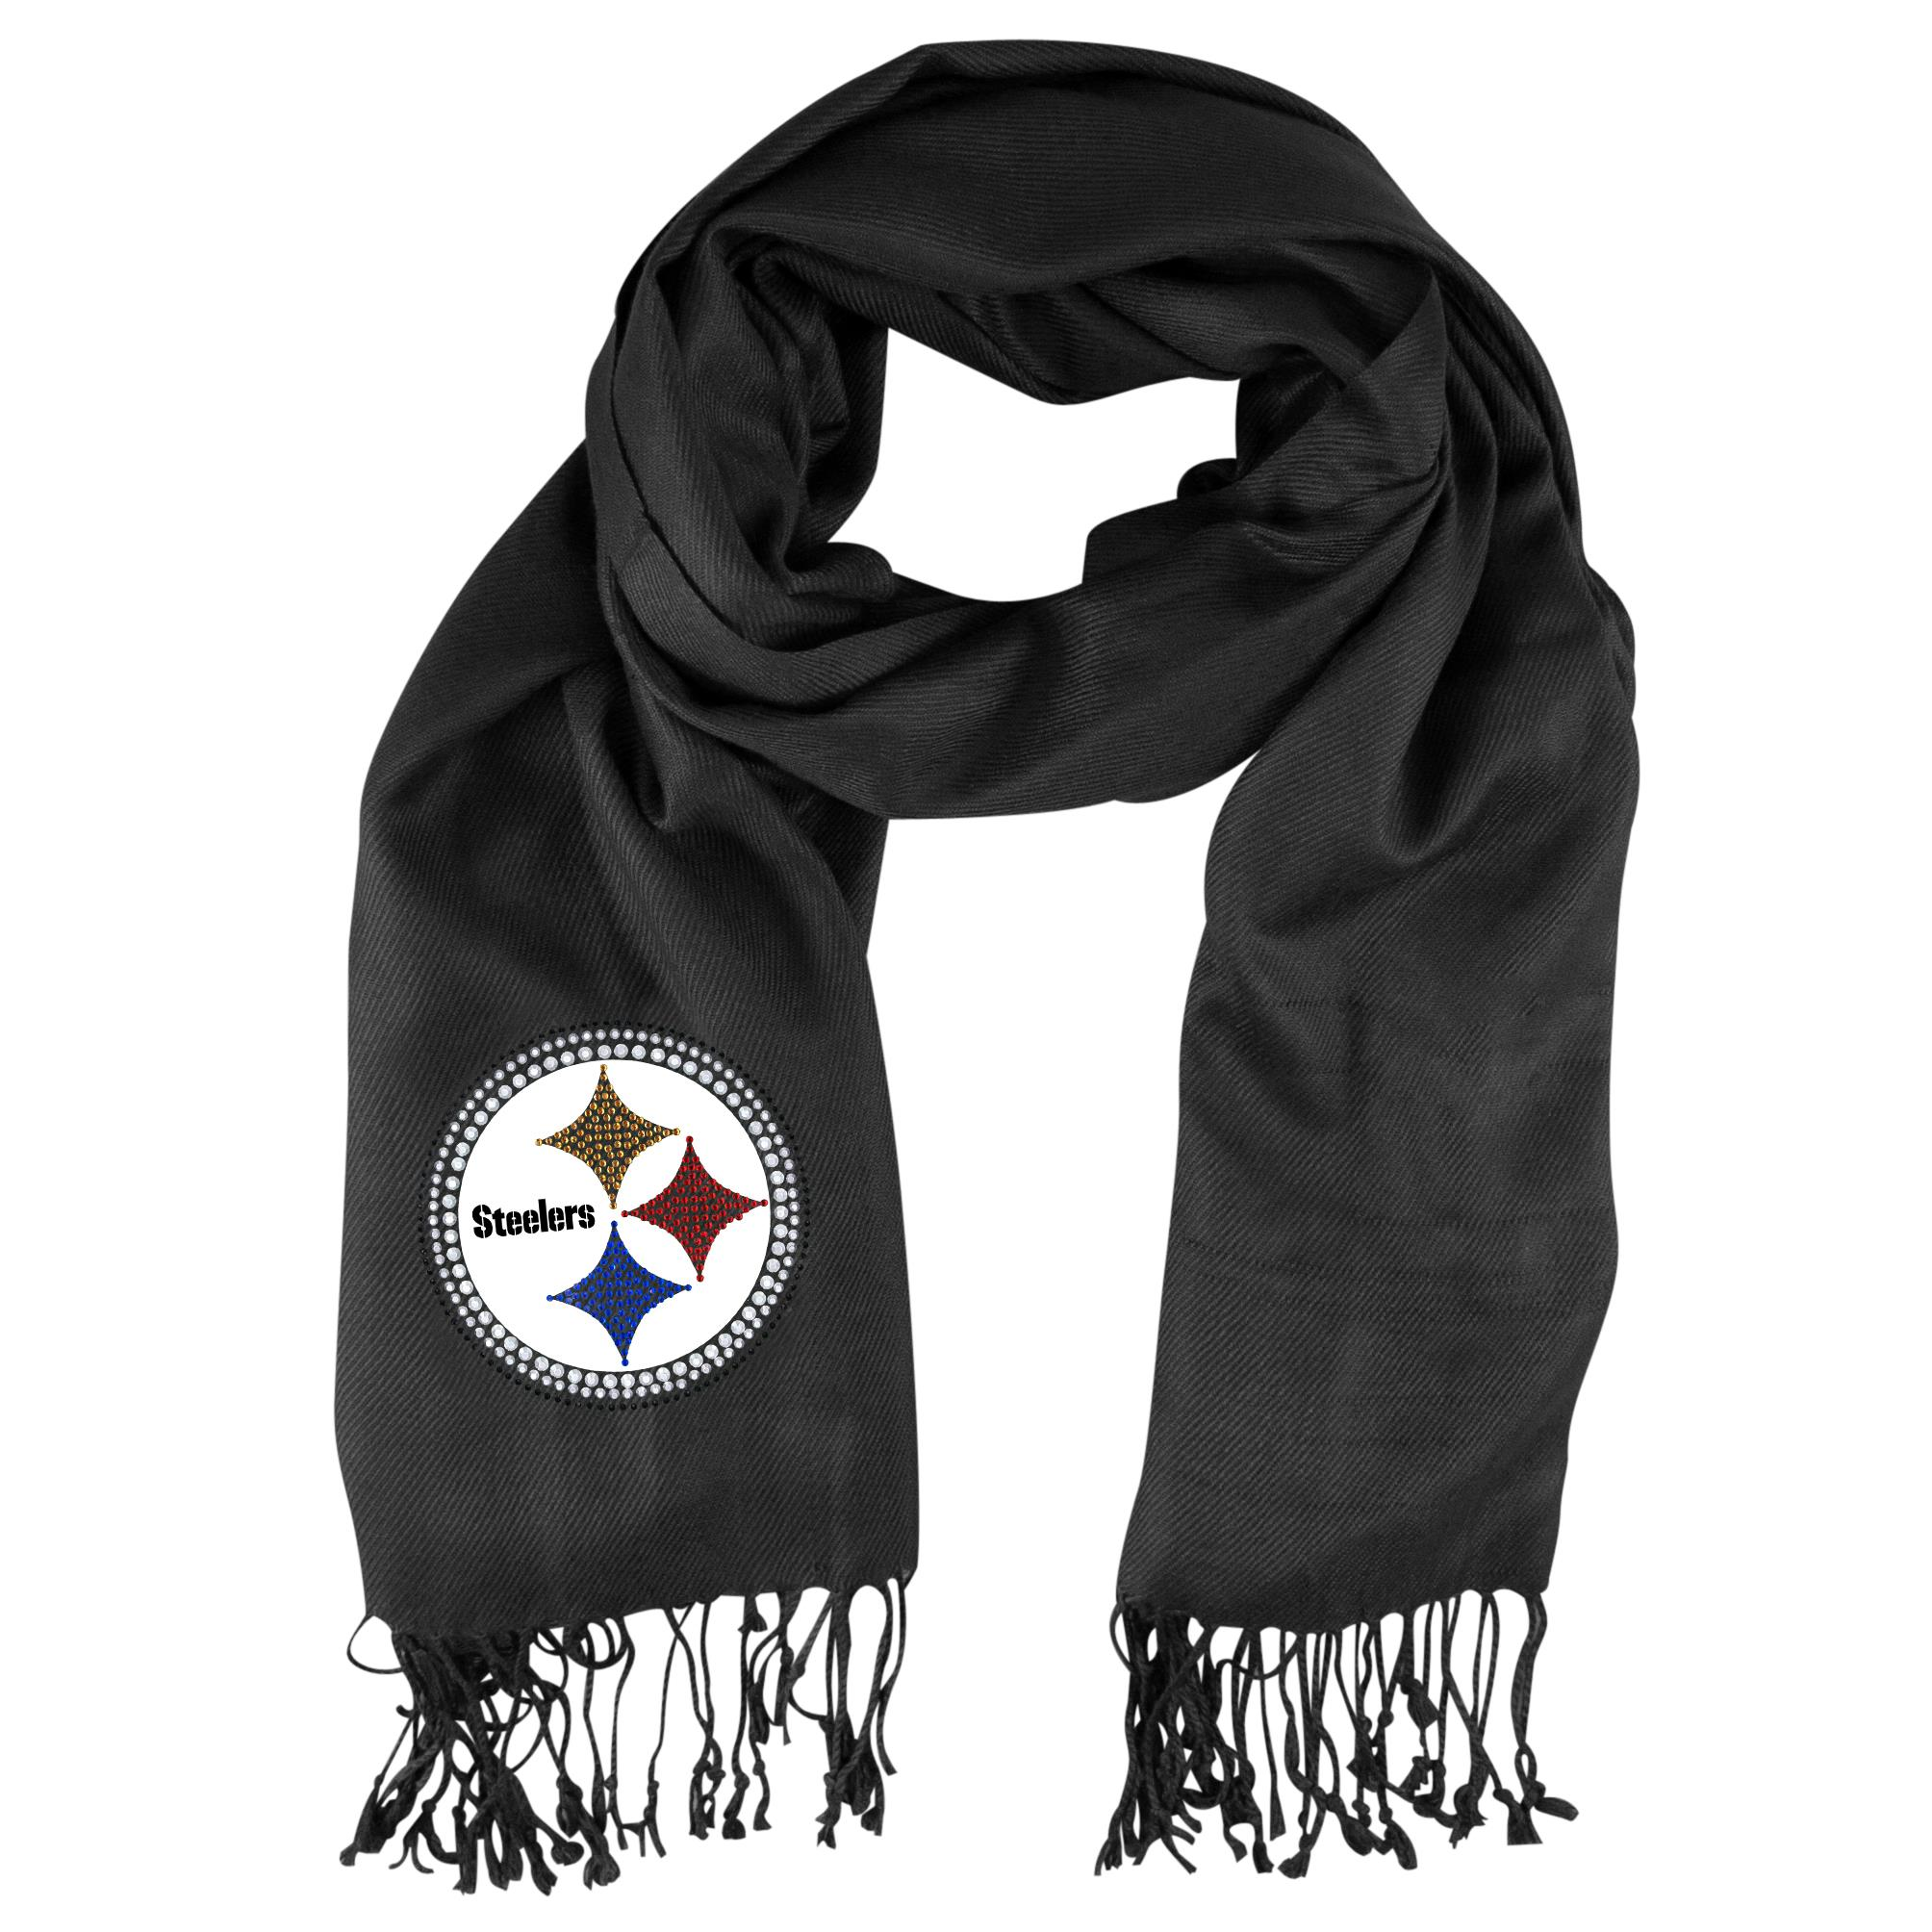 Pittsburgh Steelers Pashi Fan Scarf